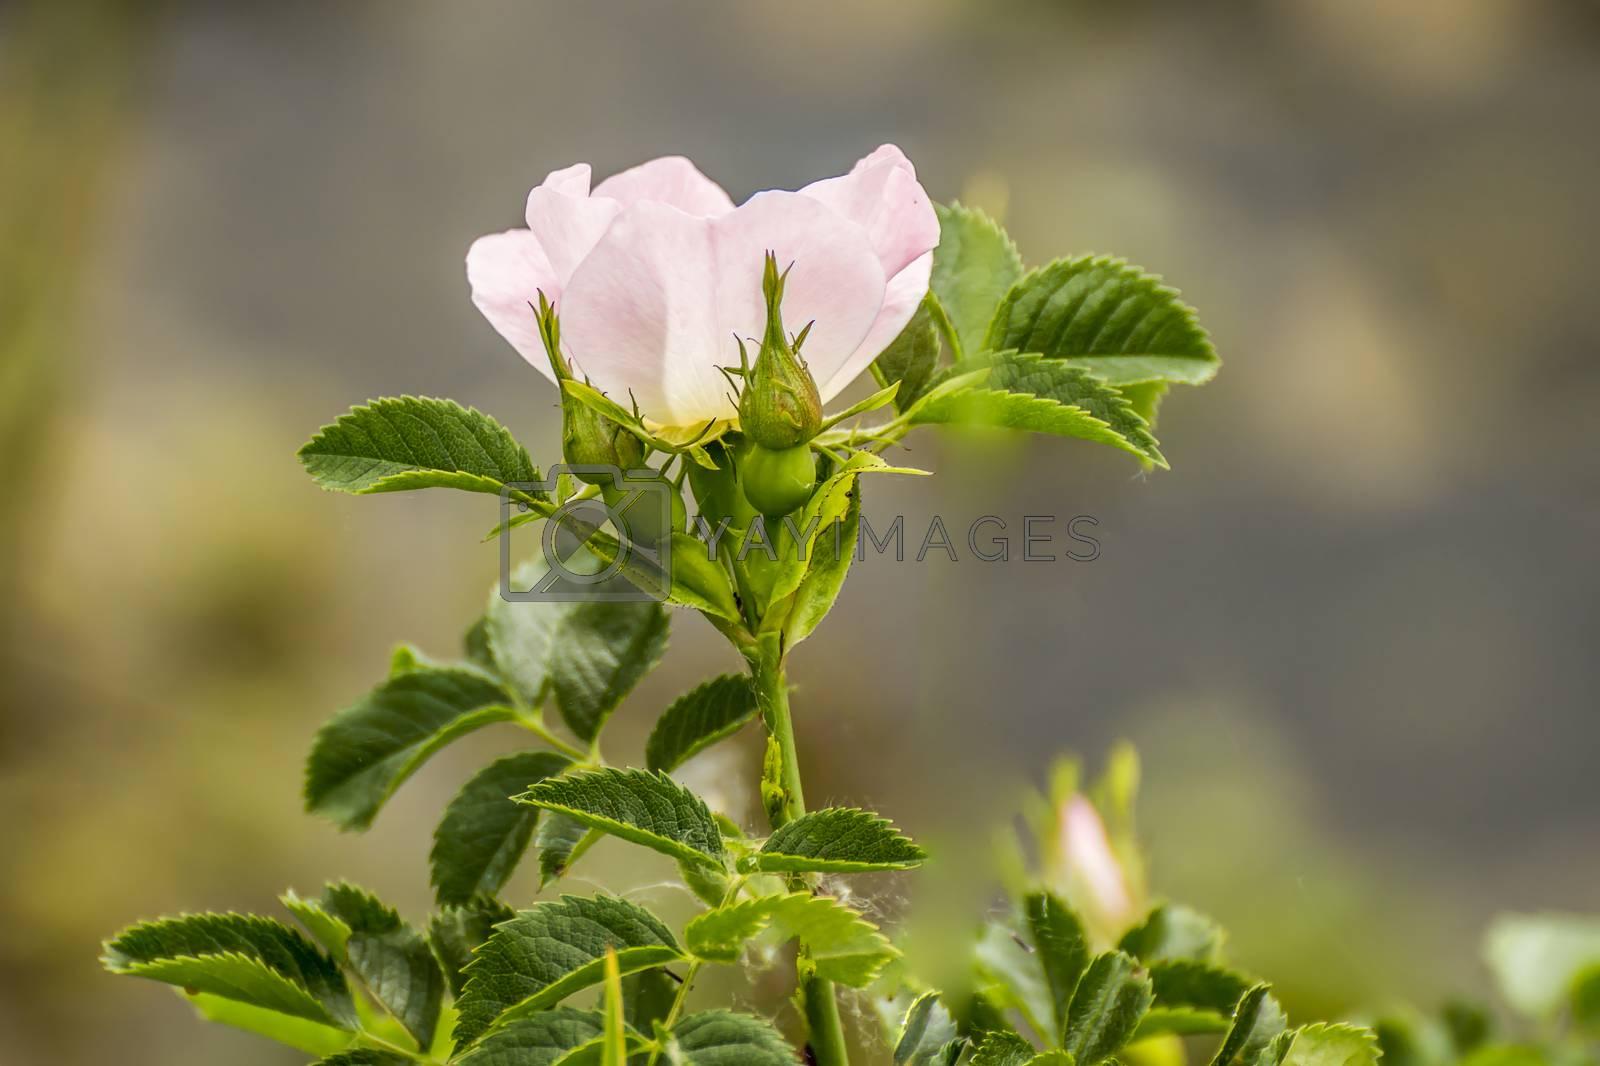 rose blossom branch in the season garden